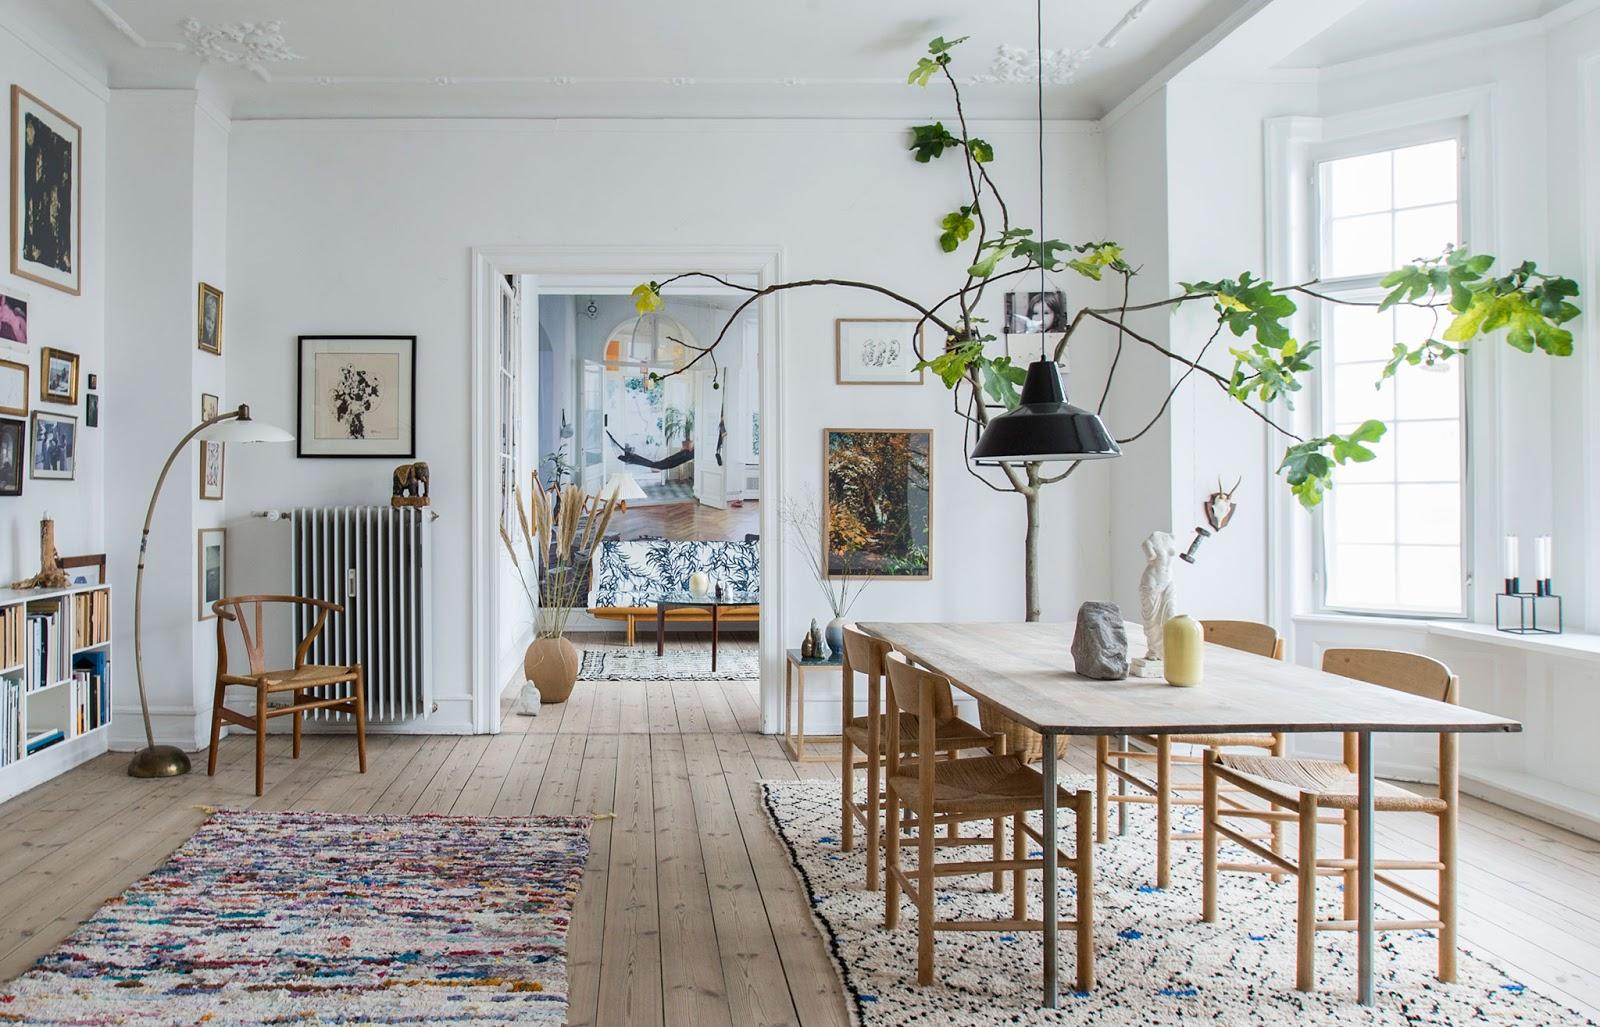 bohemian scandinavian apartment with moroccan rugs, wall art and design furniture, houseplants, hans wegner chair